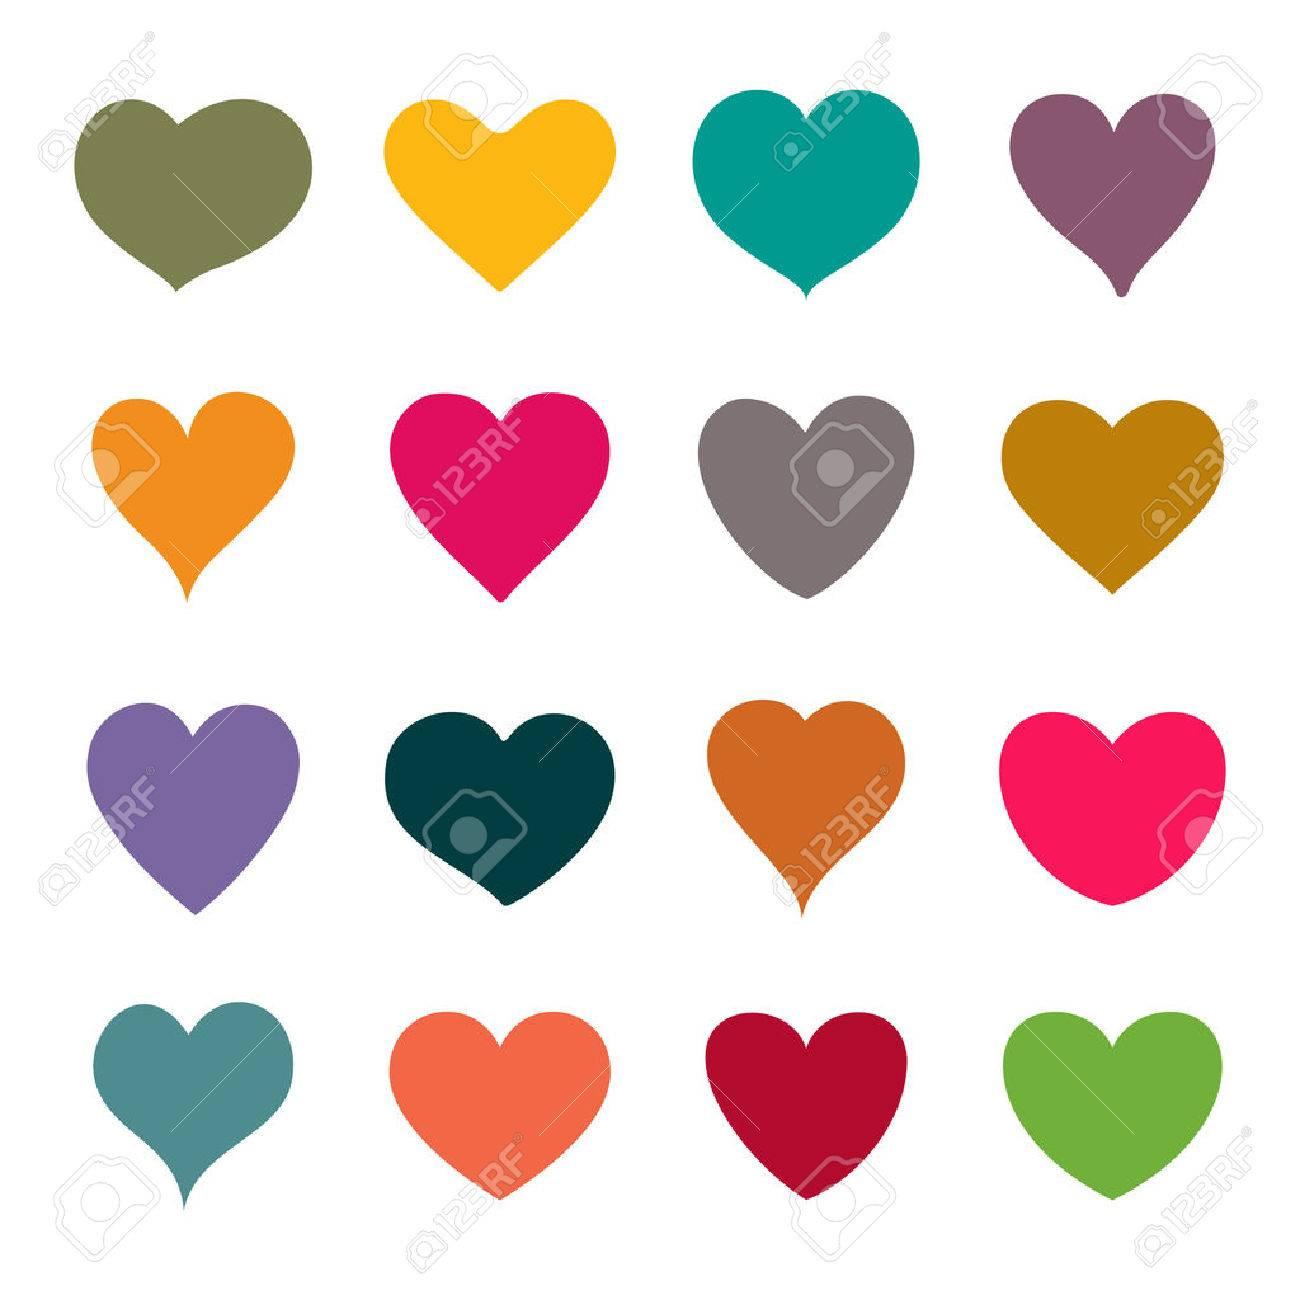 Set of vector hearts - 52359393